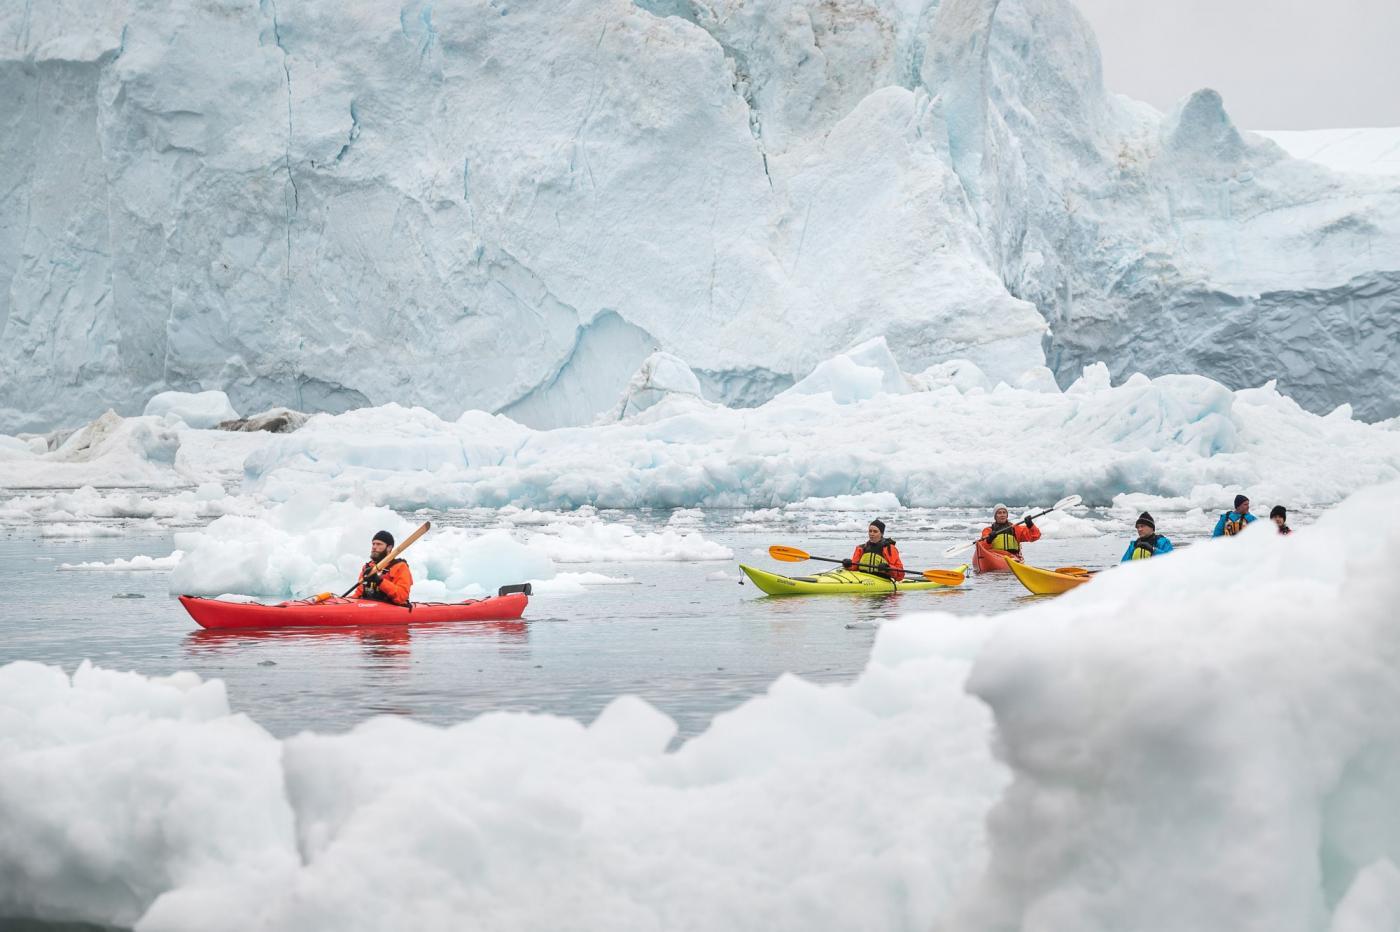 Kajakker foran isbjerge Philip. Photo by David D. Grant